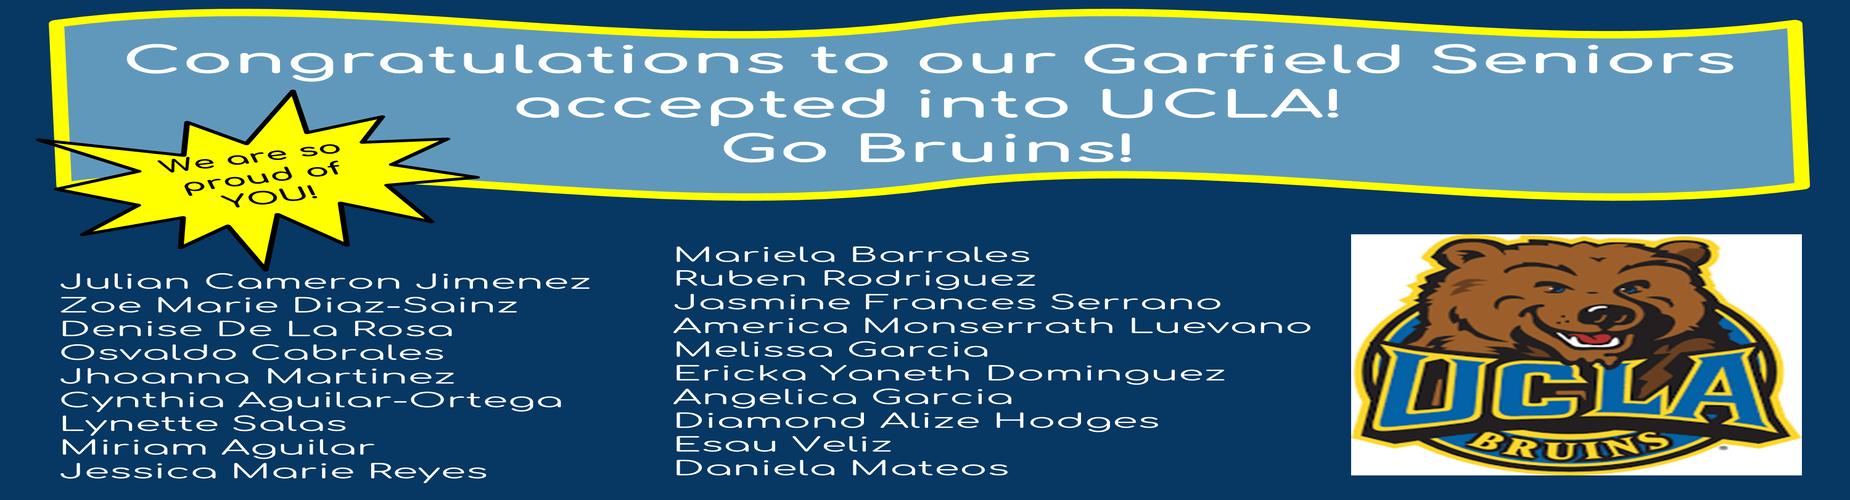 Congratulating Garfield Seniors Acceptance to UCLA